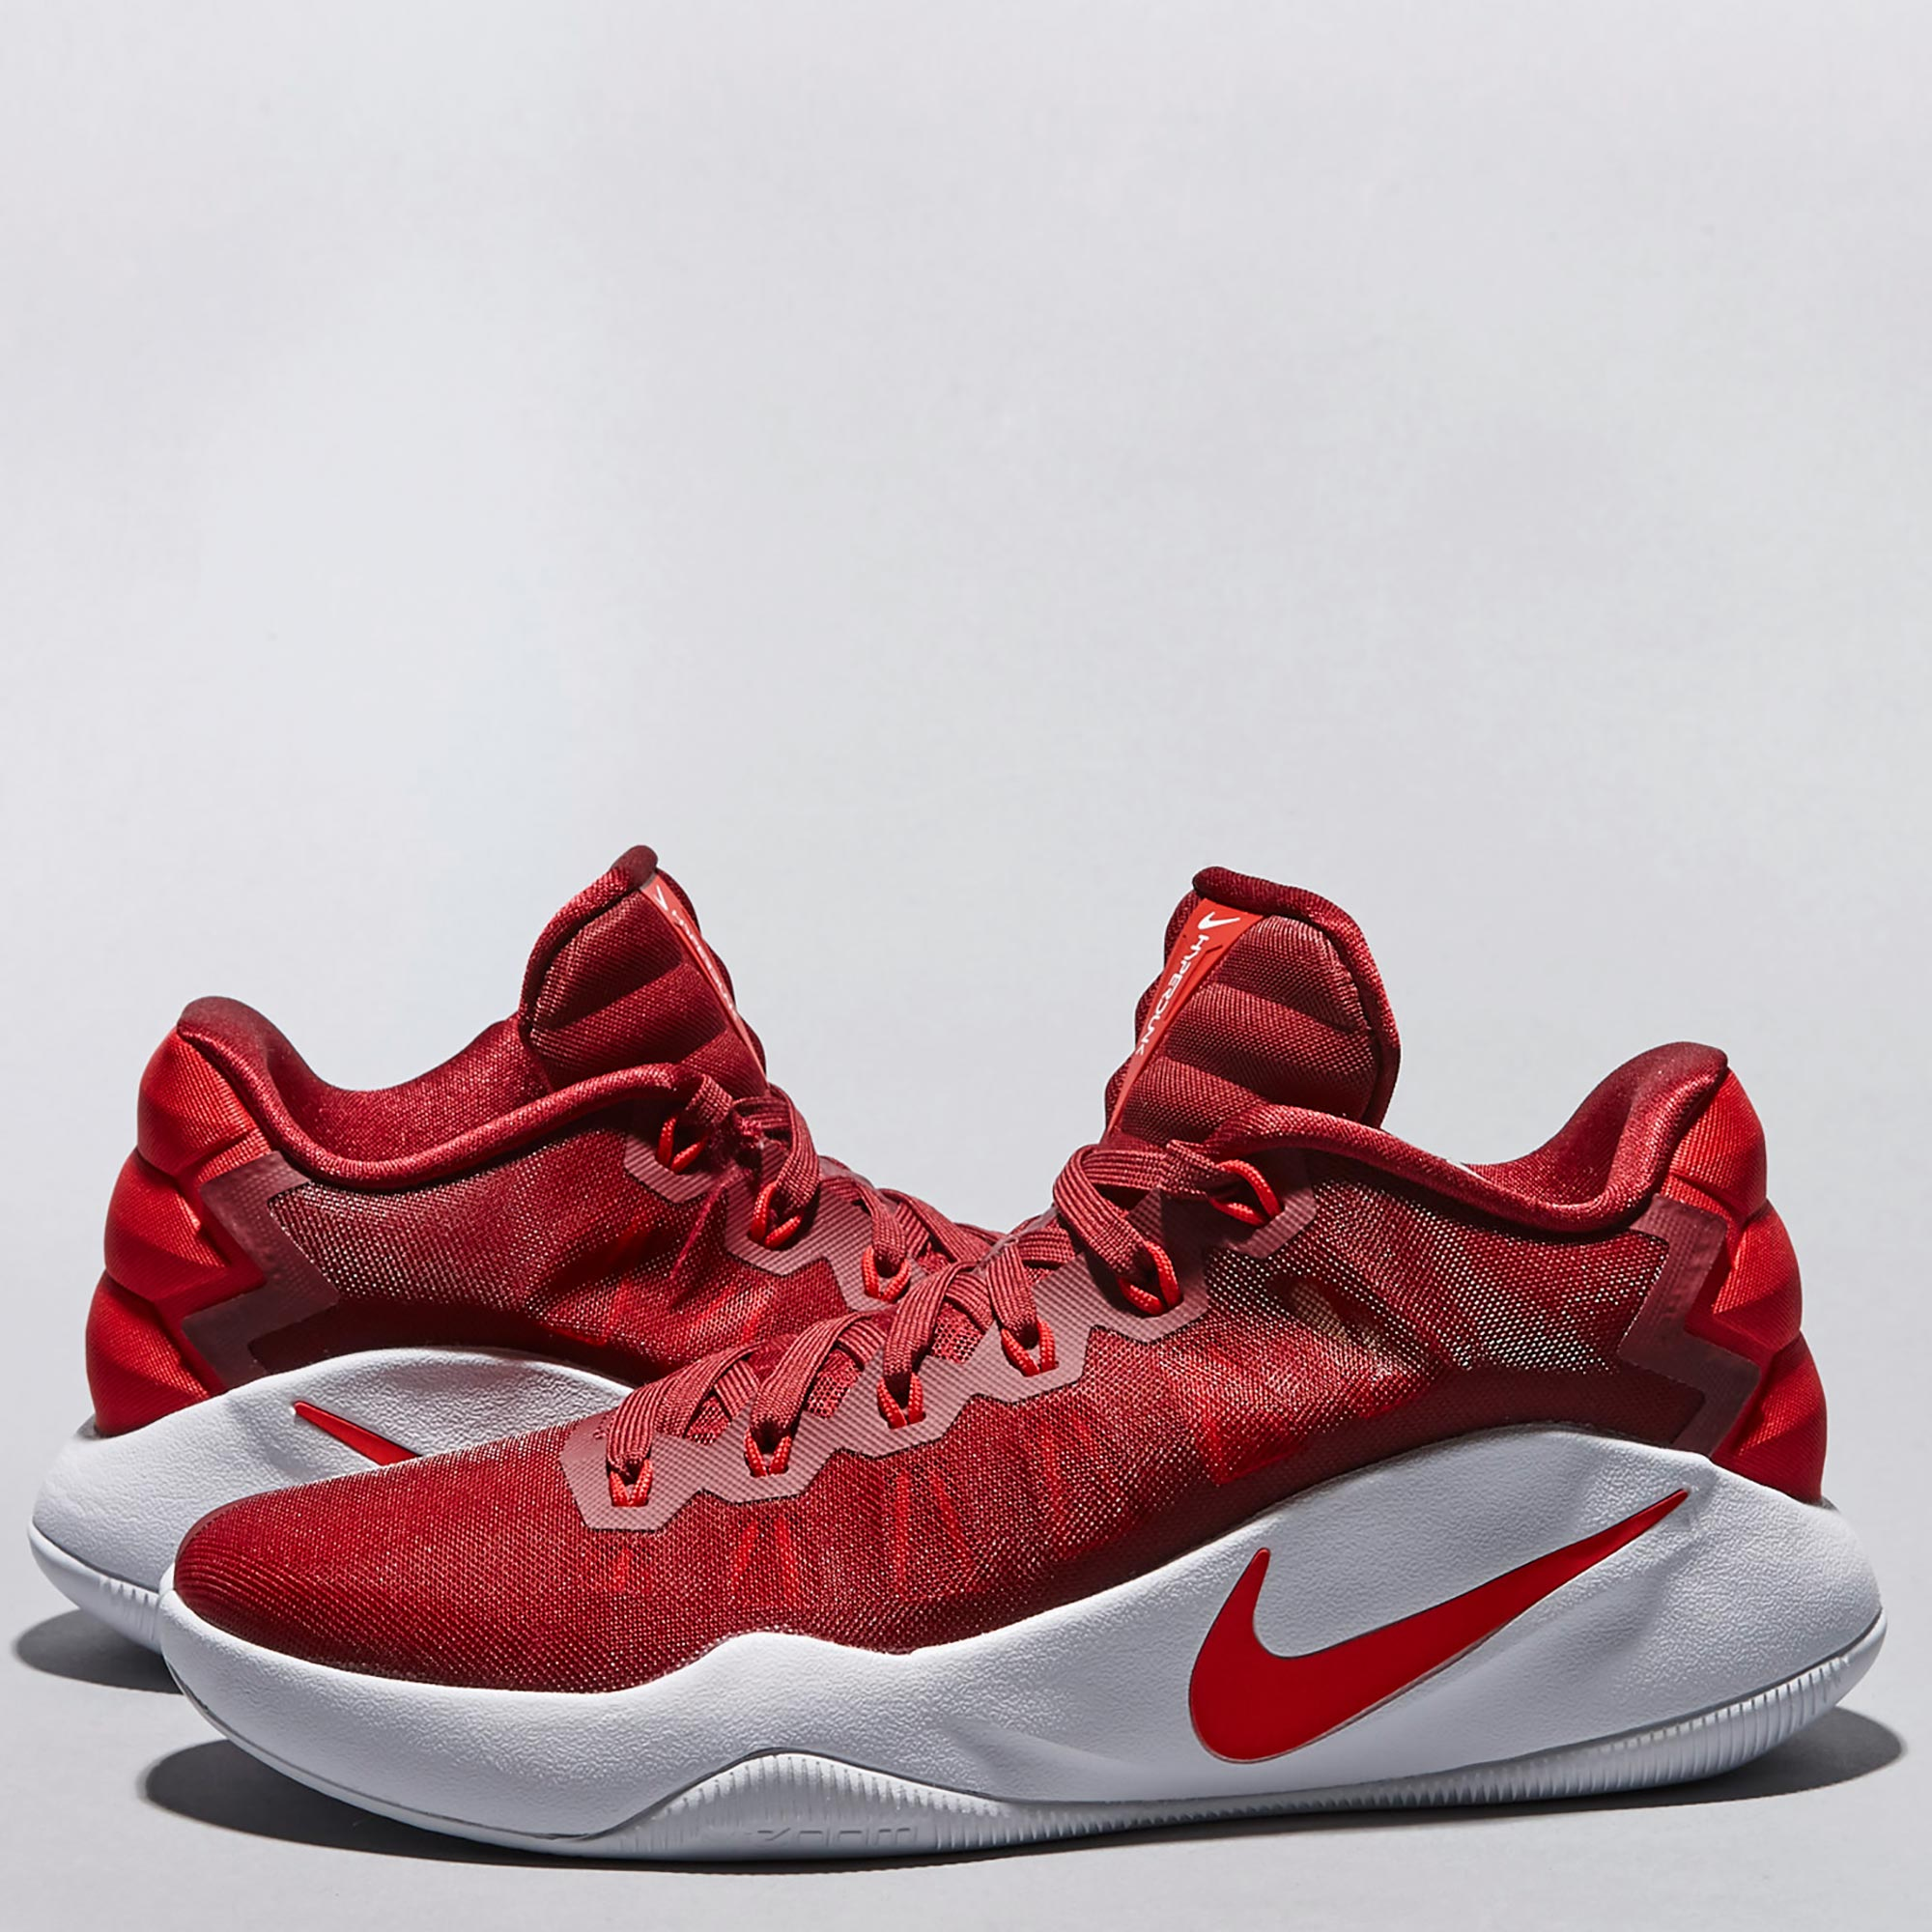 Nike Hyperdunk 2016 Low Basketball Shoe - University Red/White